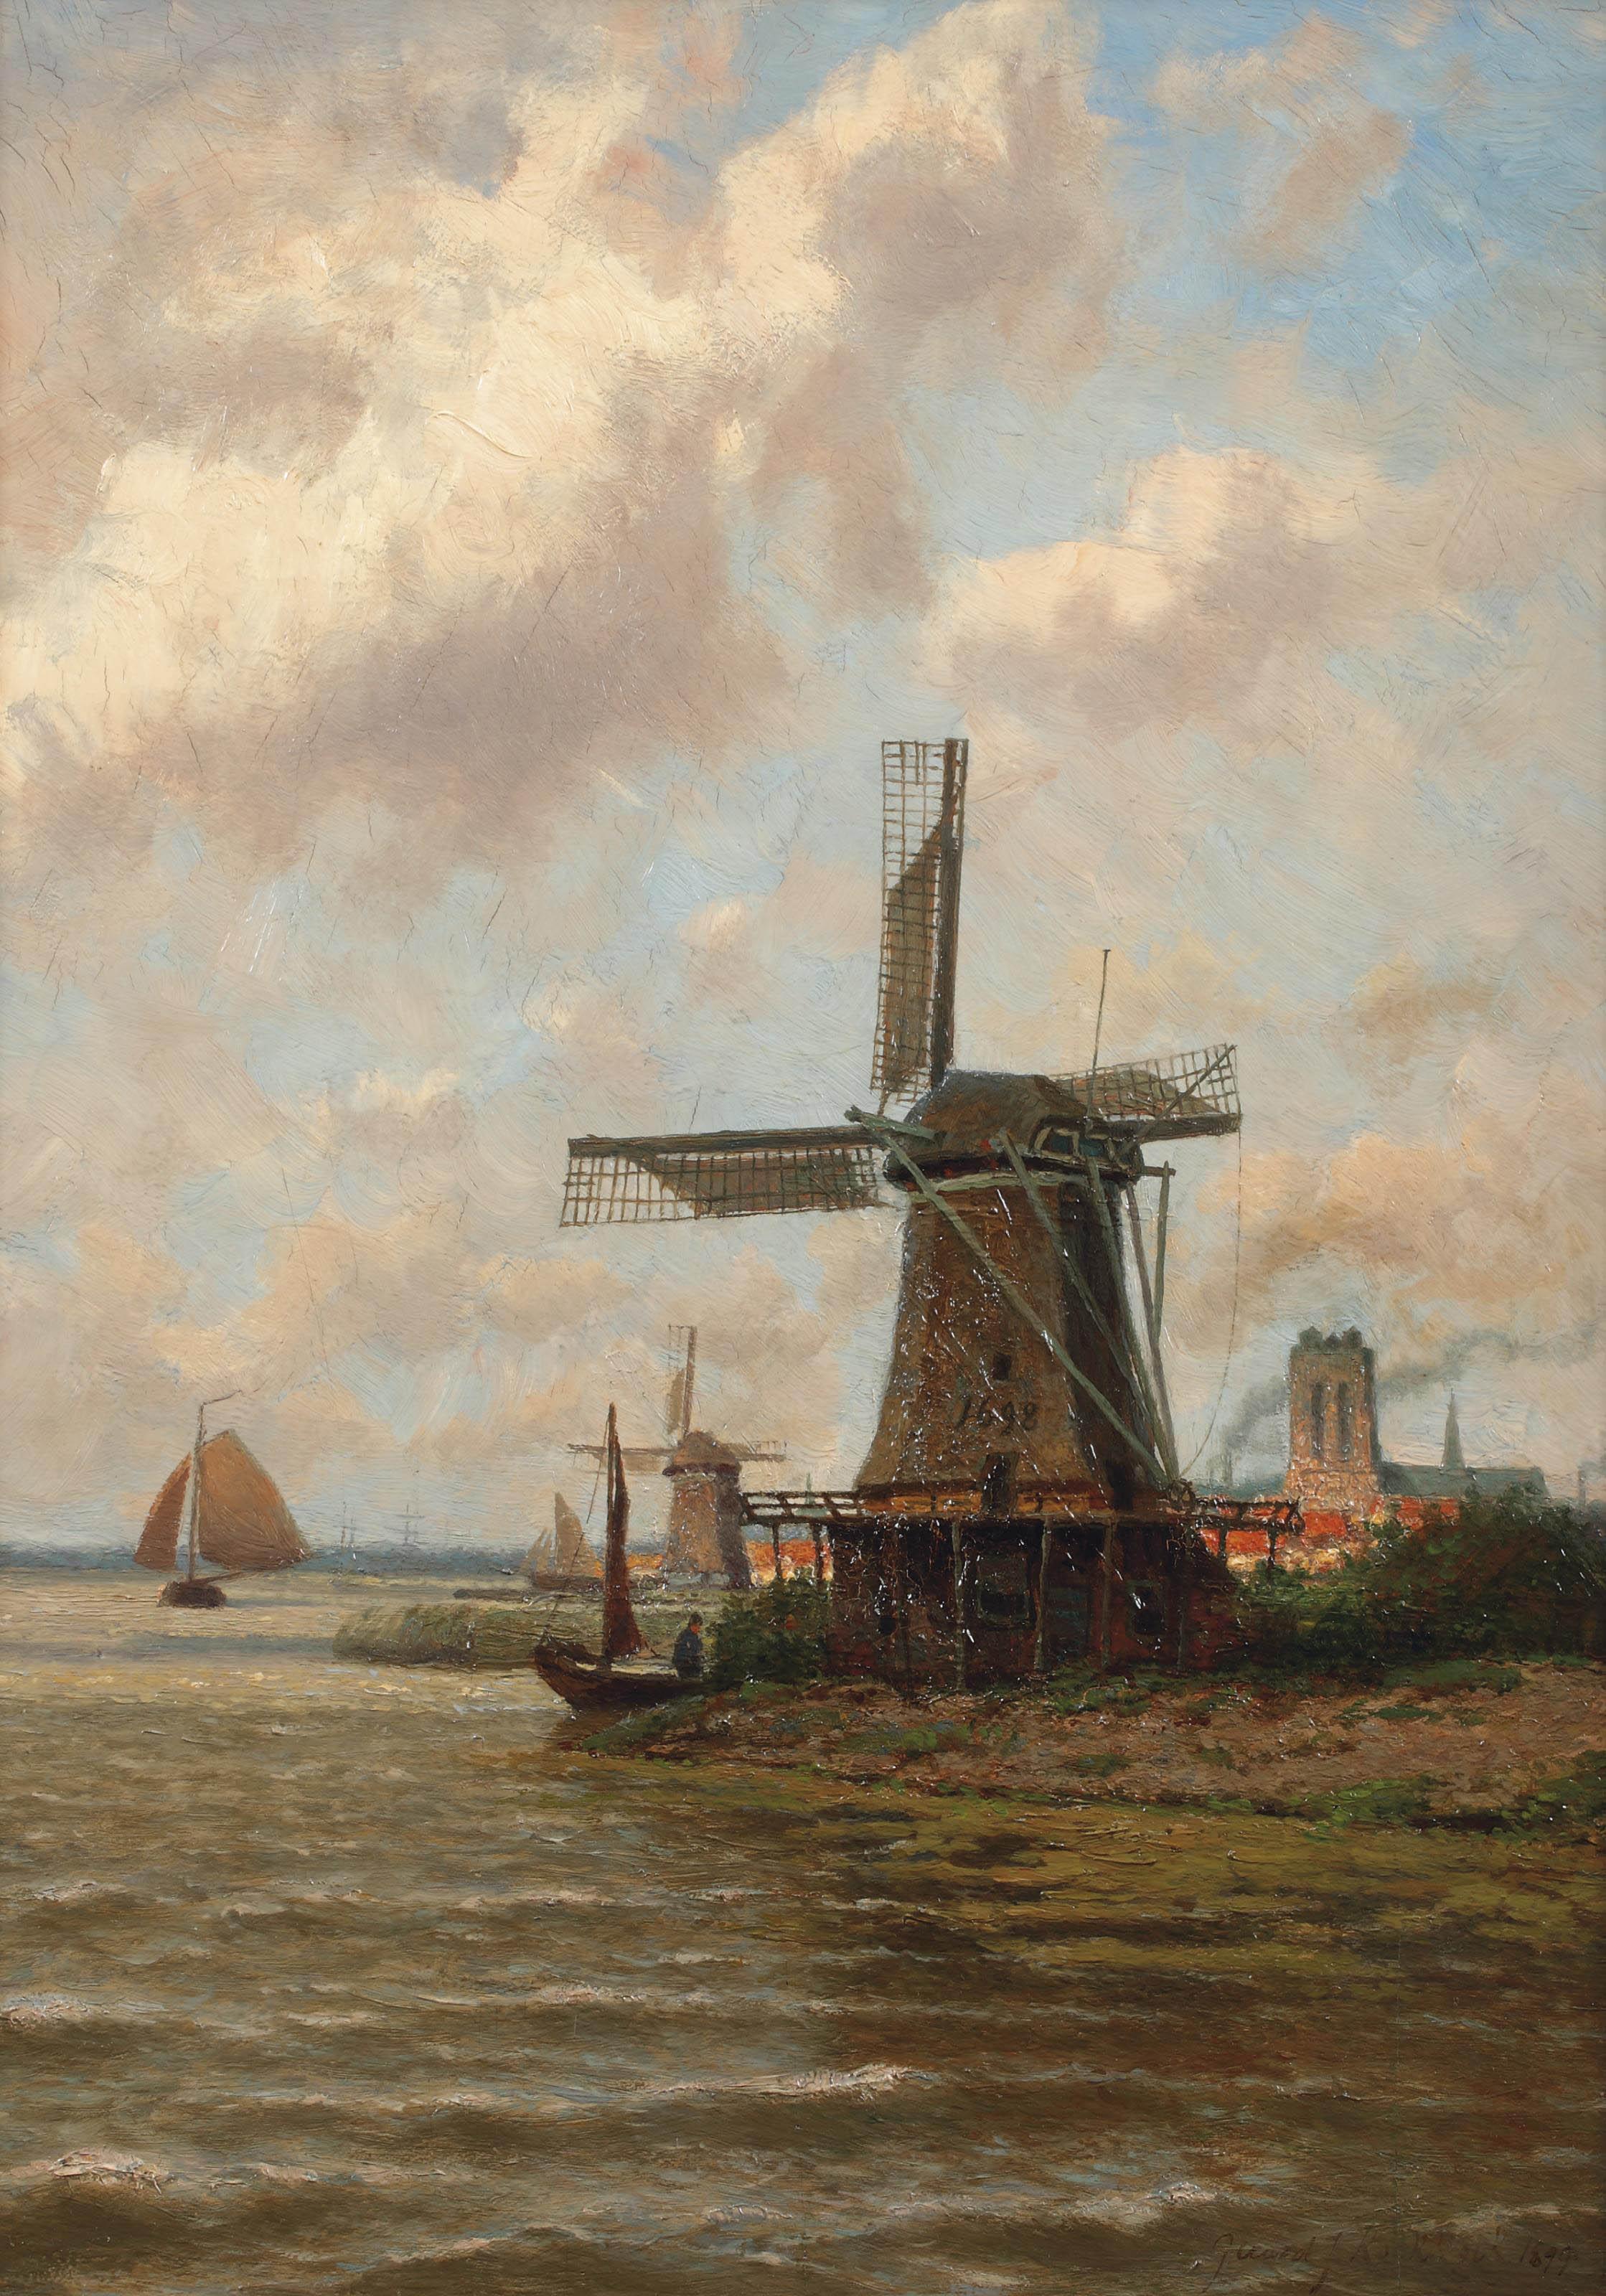 A view of Dordrecht with windmill 'De Eendragt'